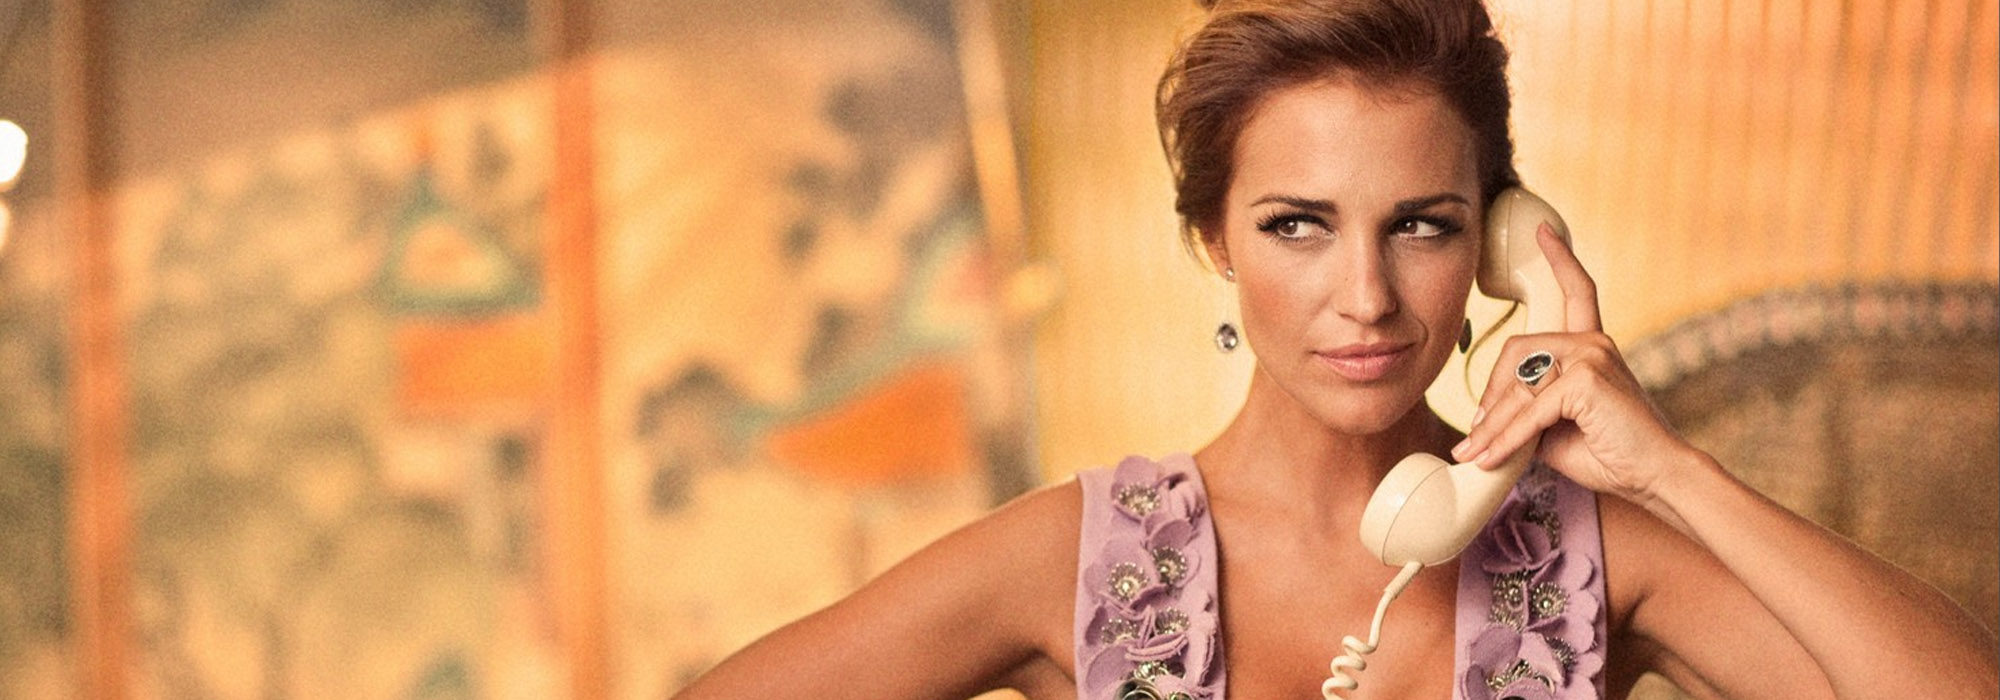 De Paula Echevarría a Dulceida: El trasvase entre televisivas e influencers de moda